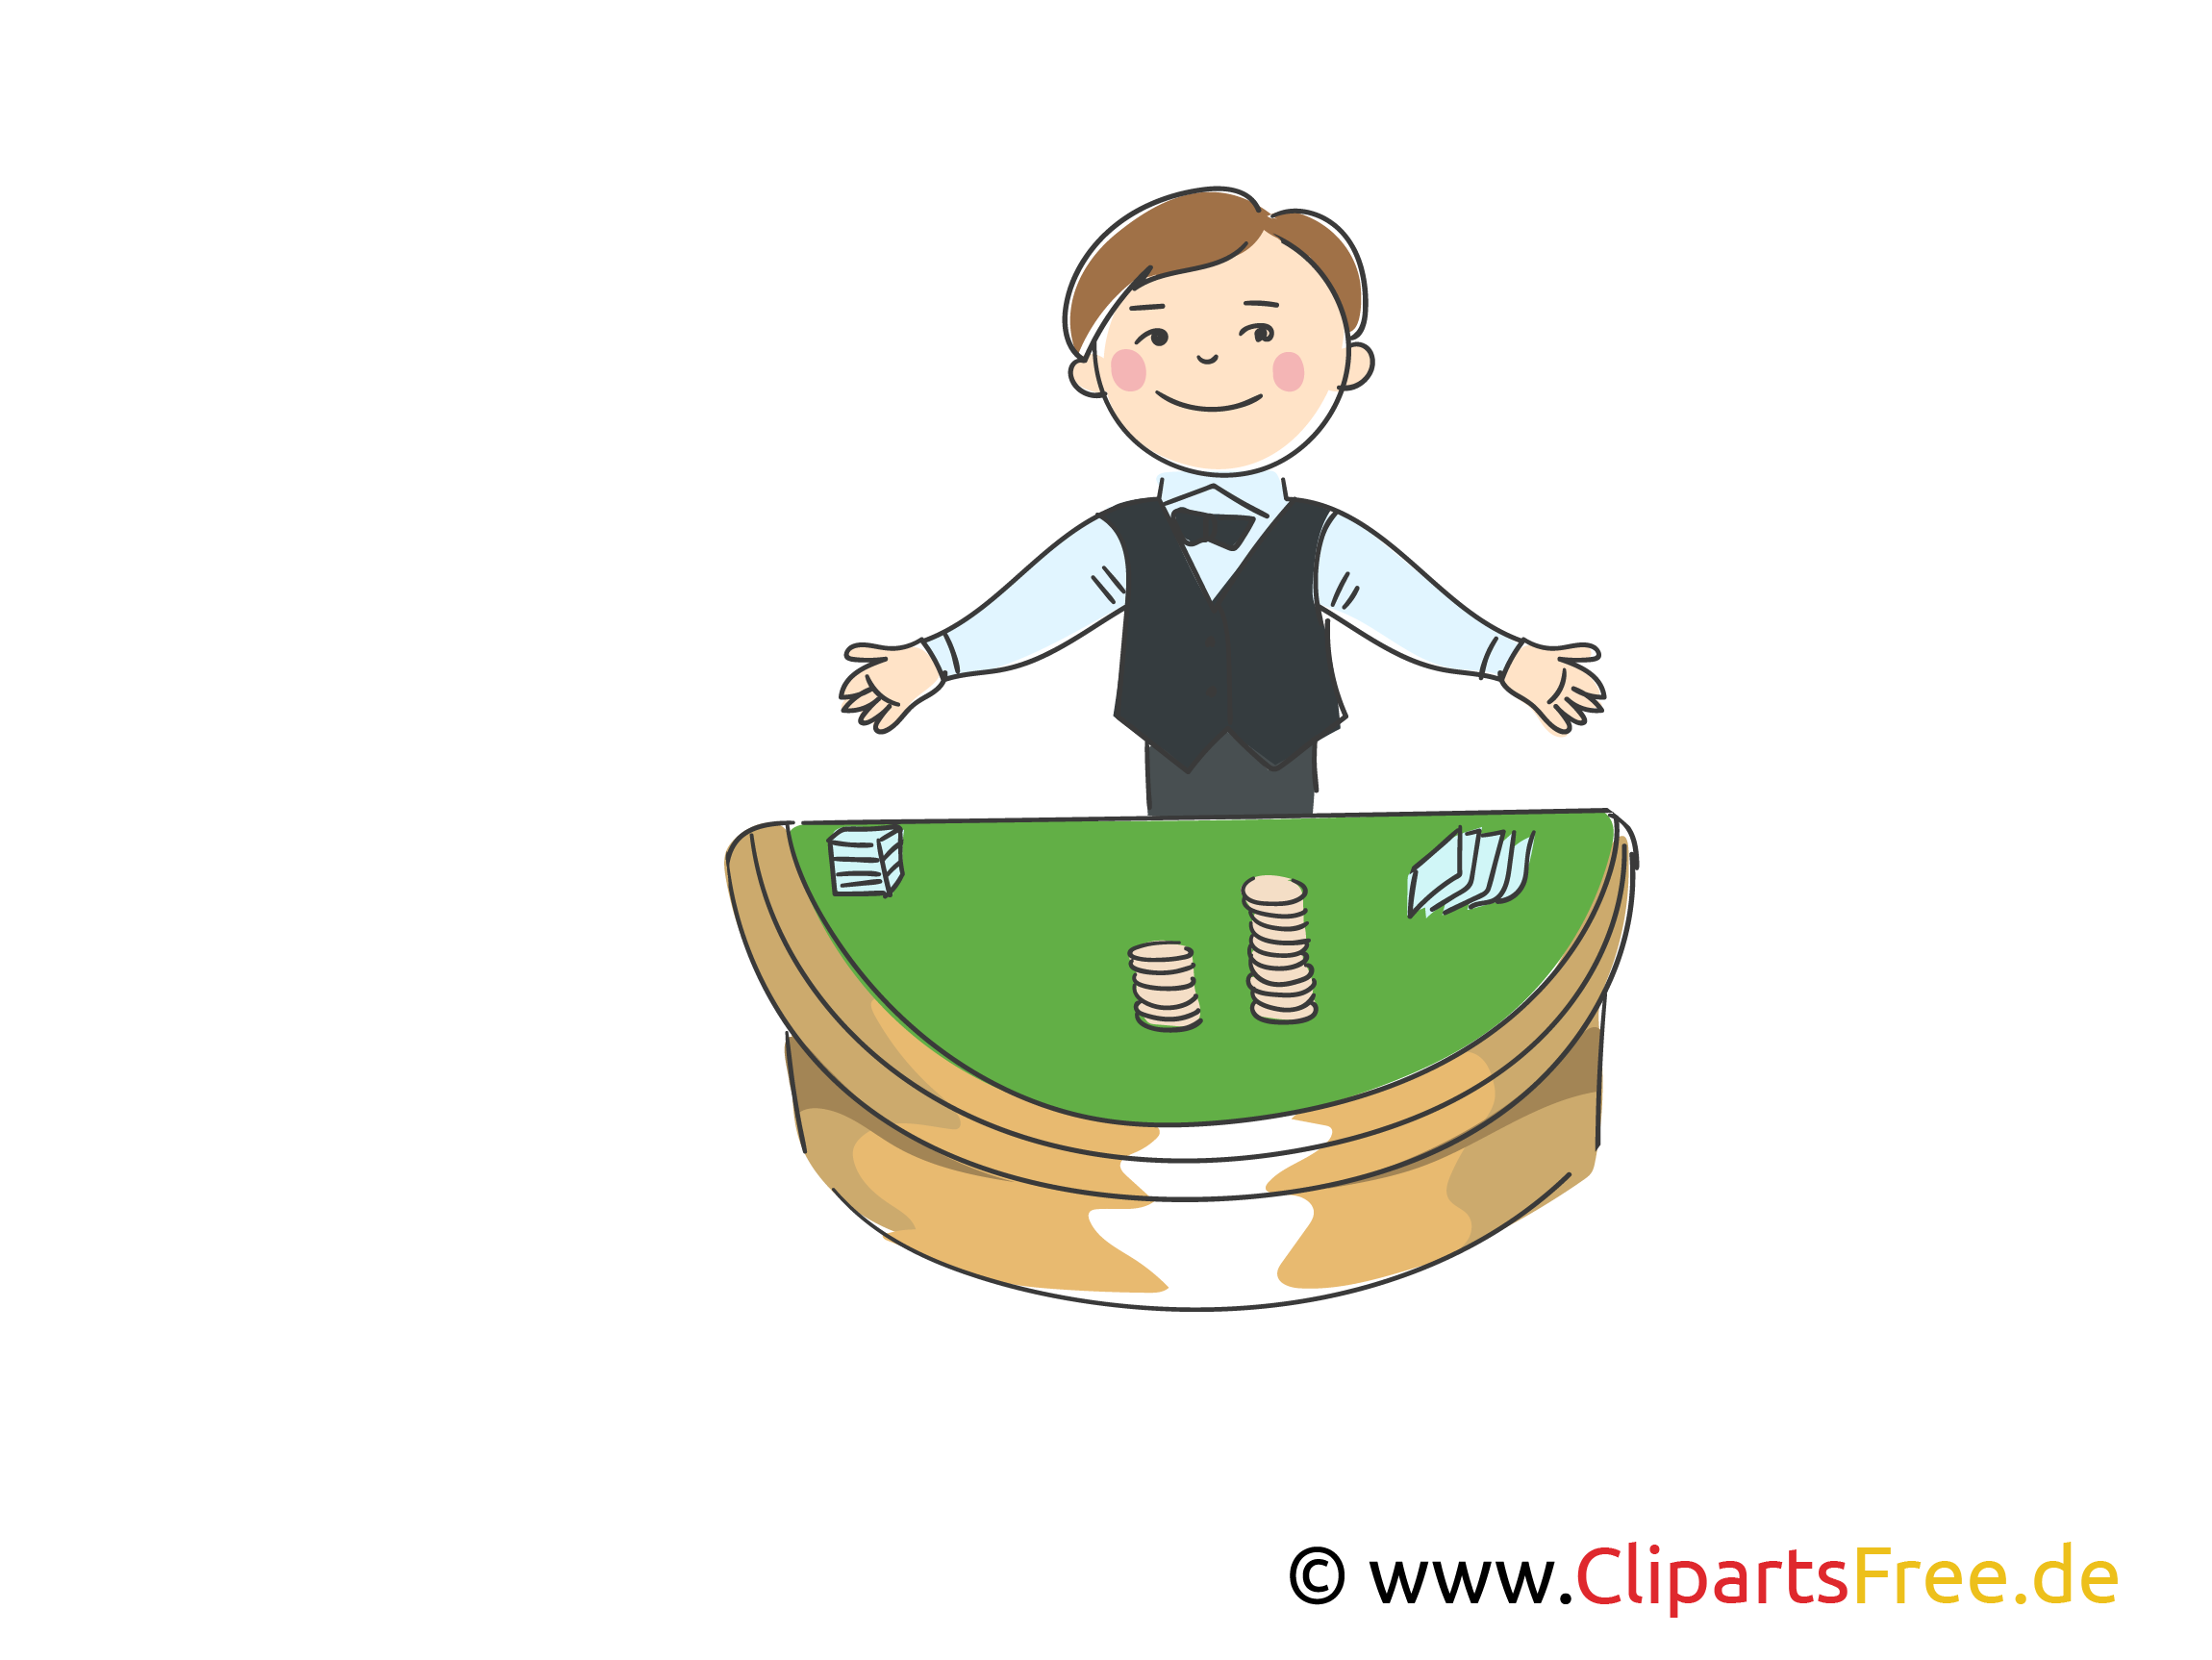 Croupier in Casino Clipart, Bild, Illustration